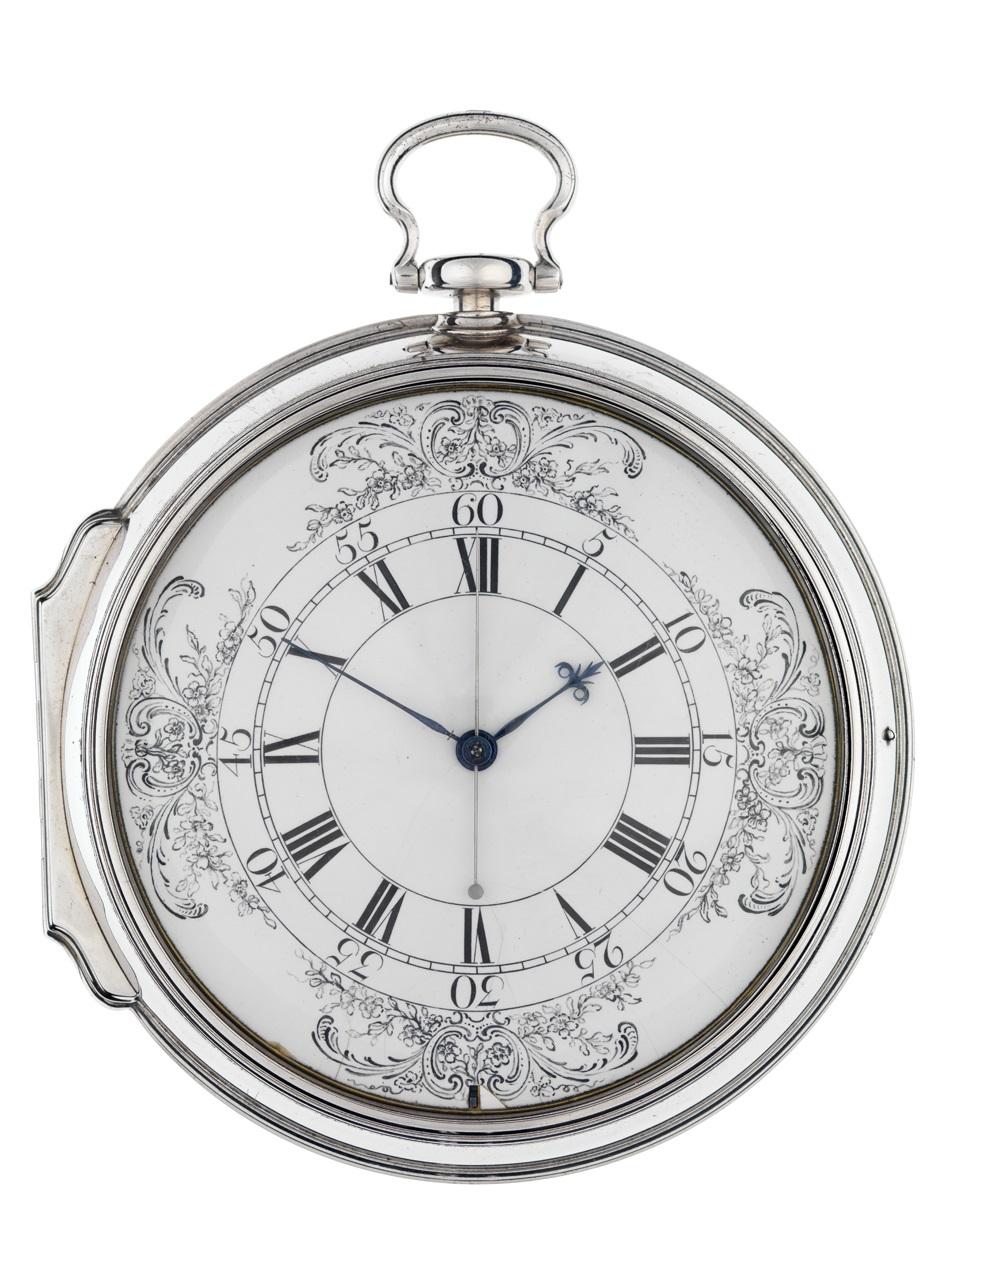 H4, Harrison Chronometer.